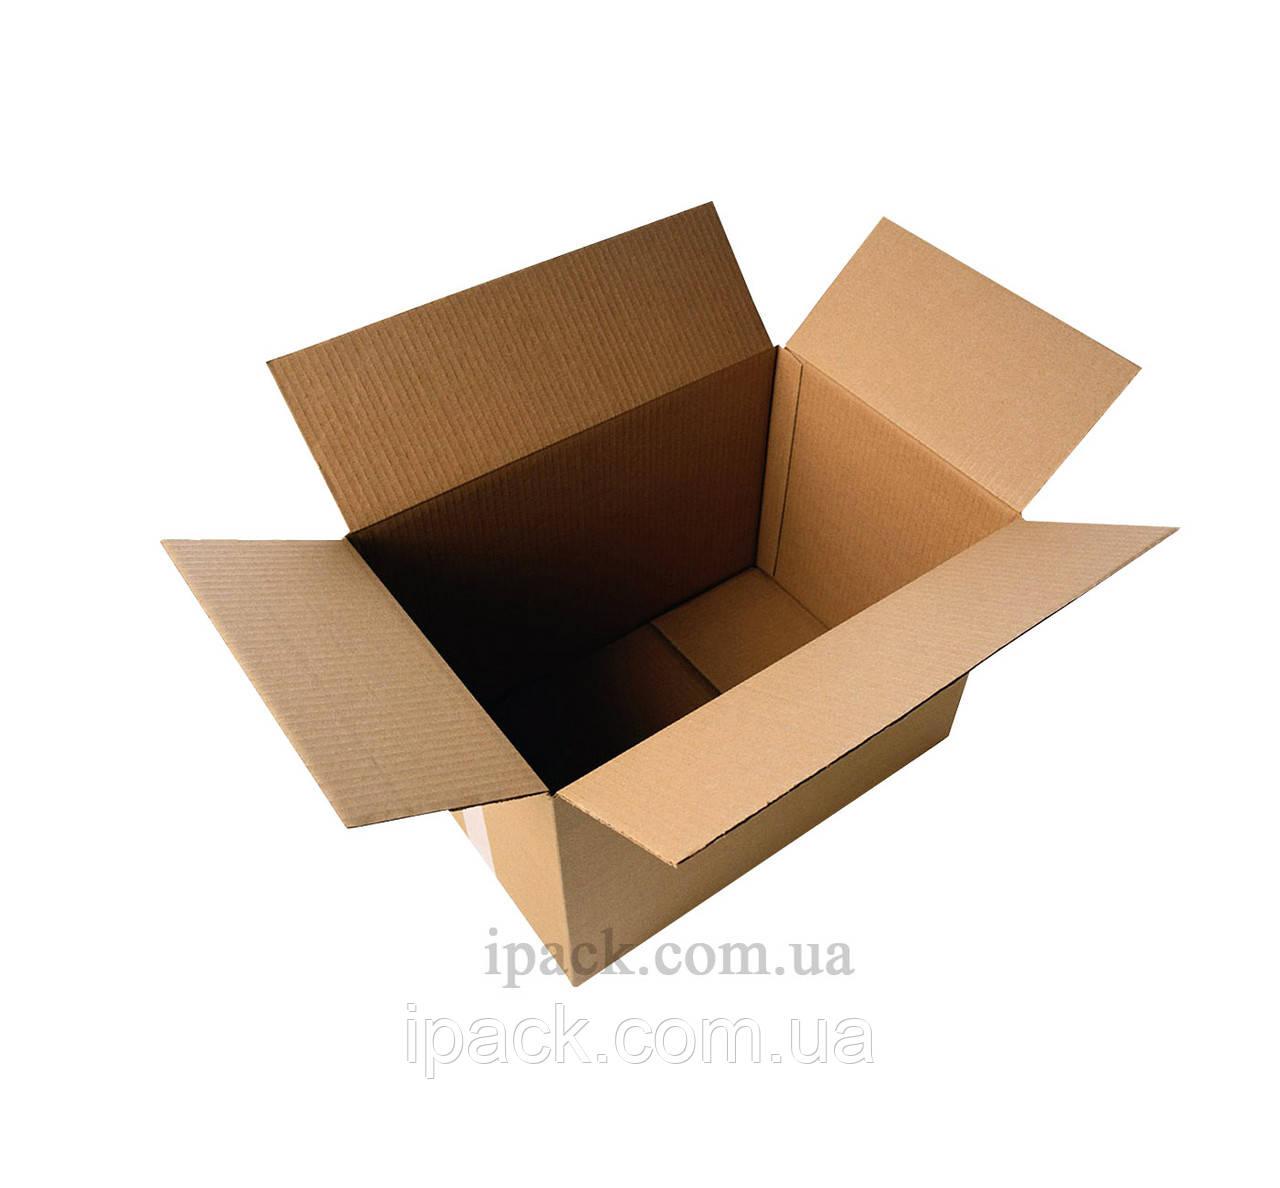 Гофроящик 300*300*290 мм, бурый, четырехклапанный картонный короб